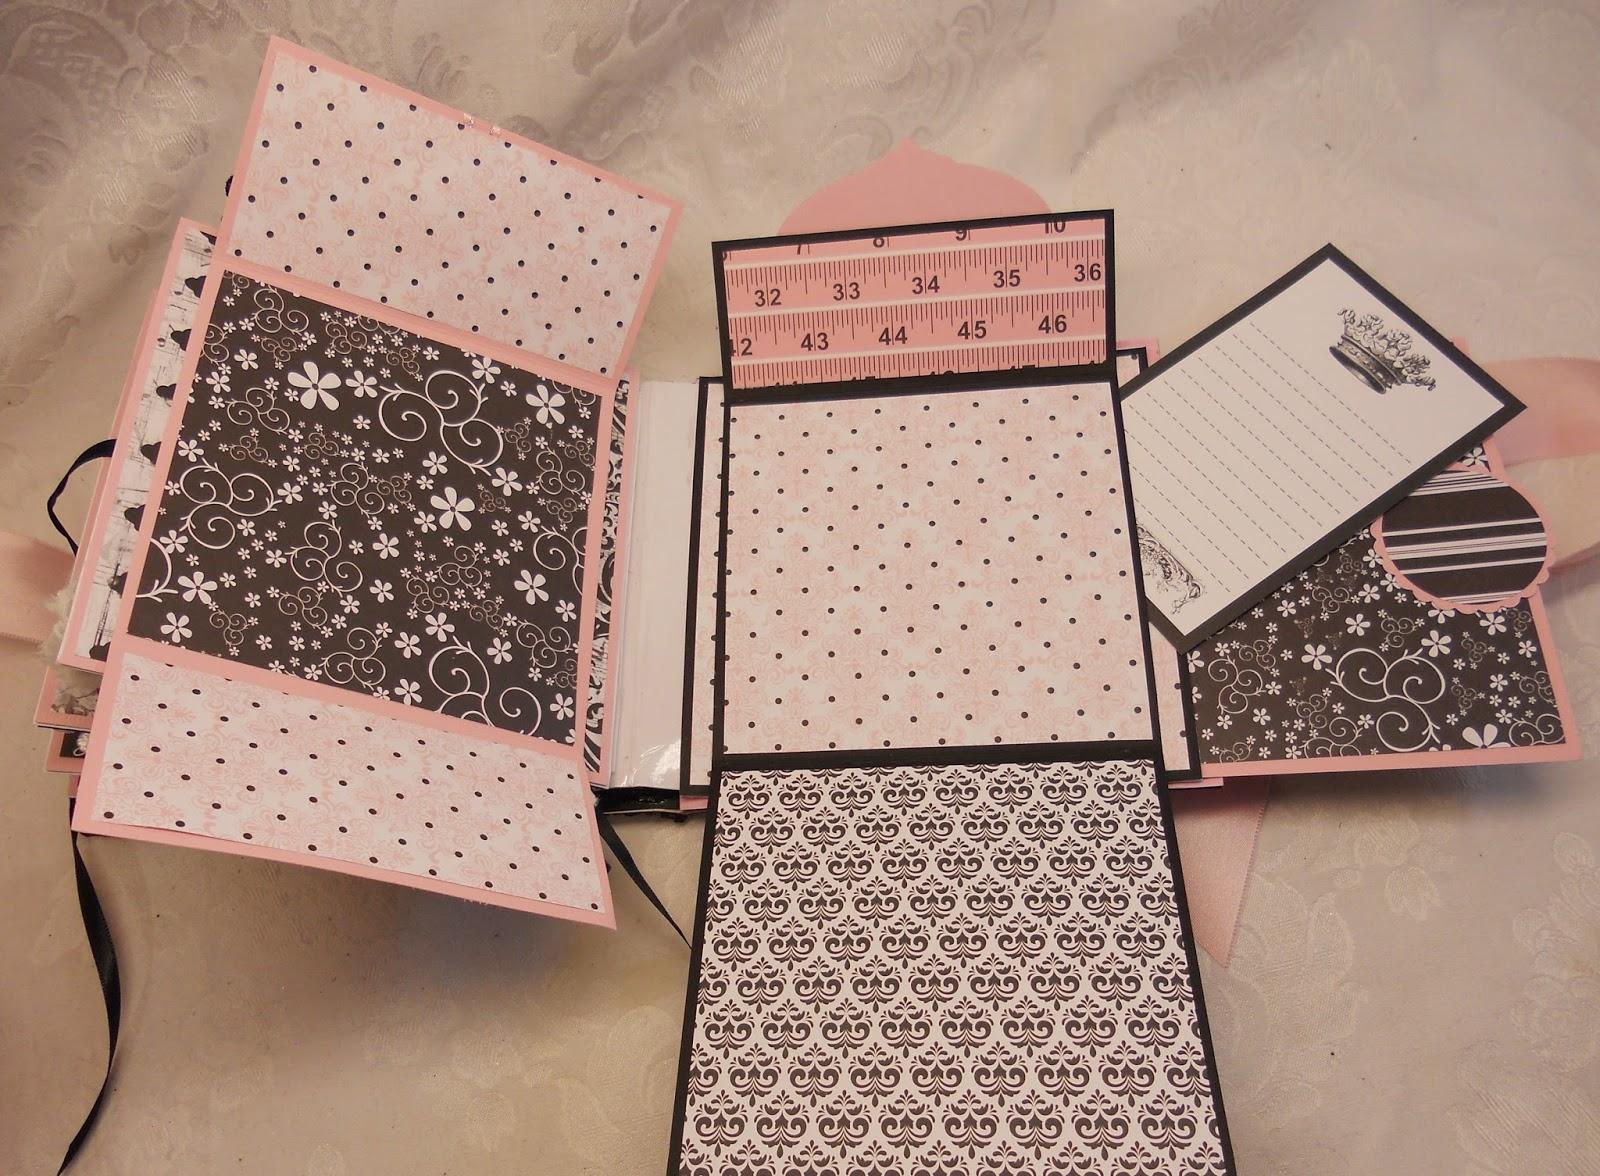 Scrapbookfashionista designs by rina teresa collins bebe - Fabriquer album photo maison ...